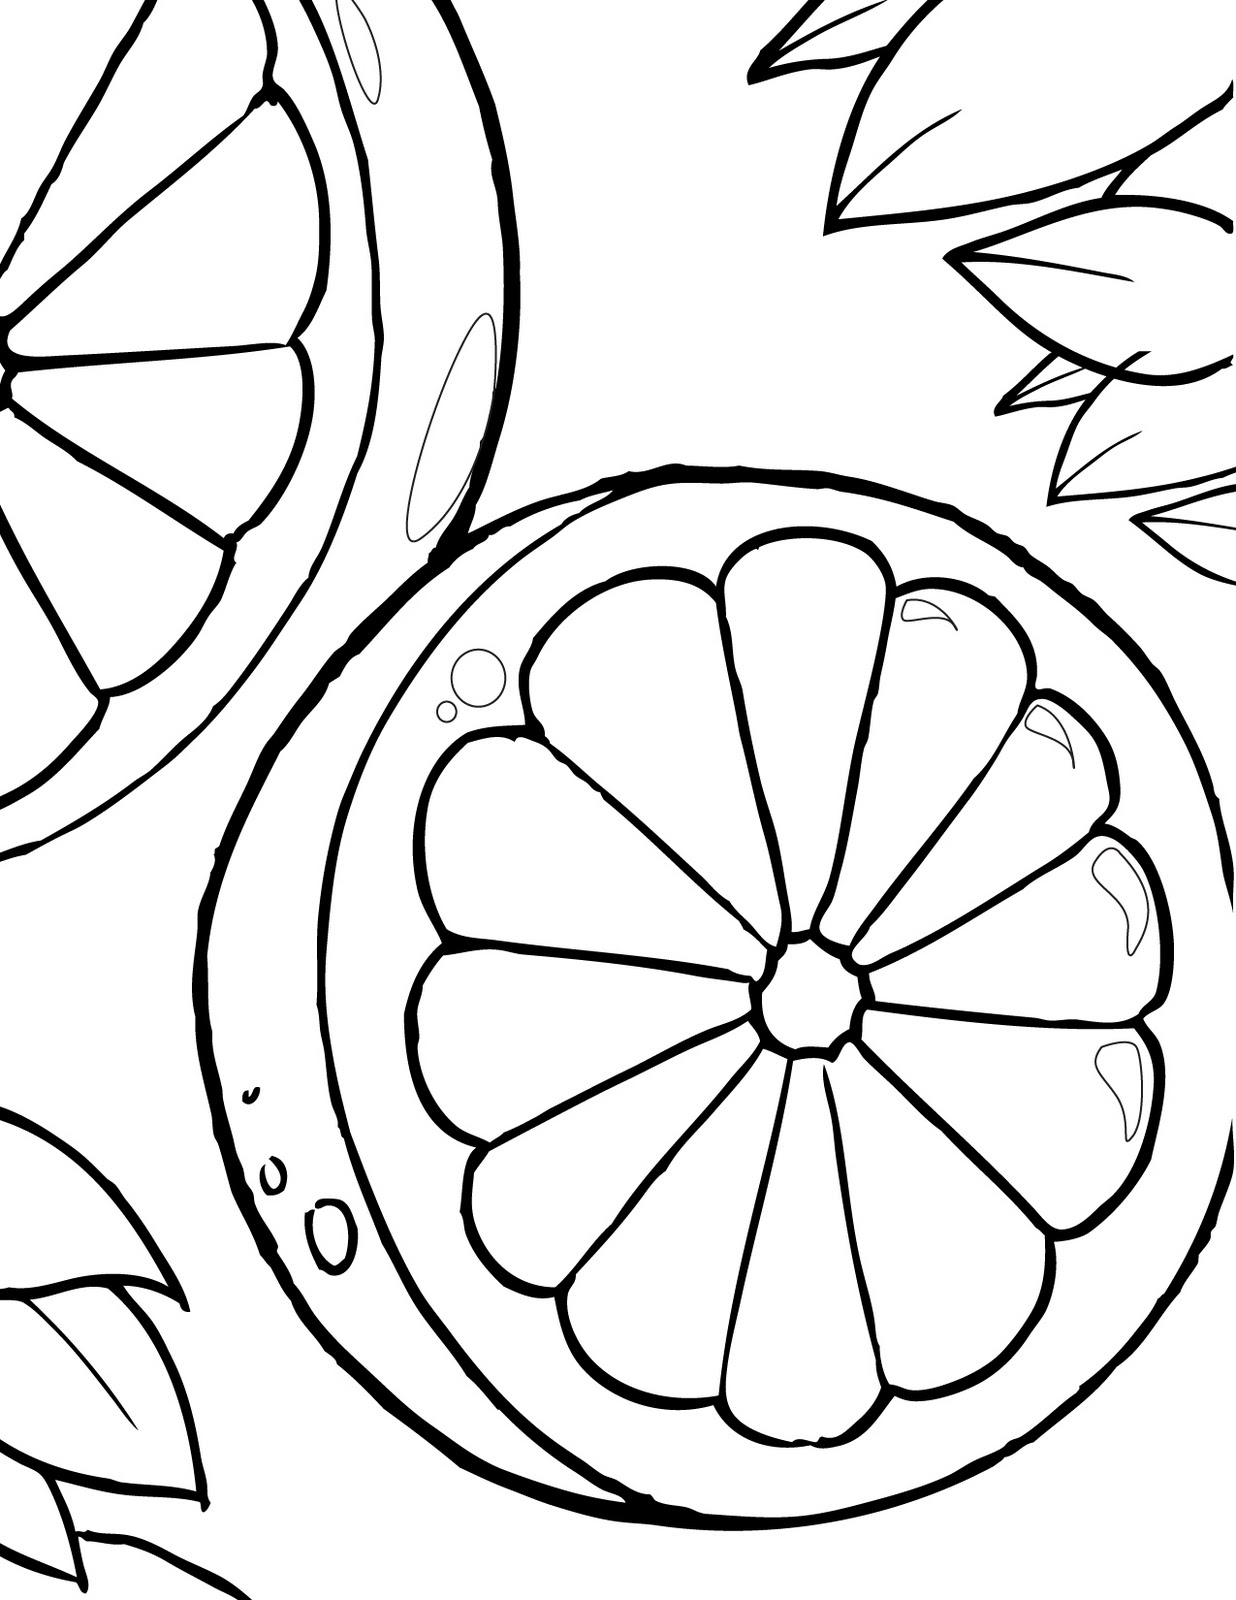 coloring printables free oranges coloring pages learn to coloring coloring printables